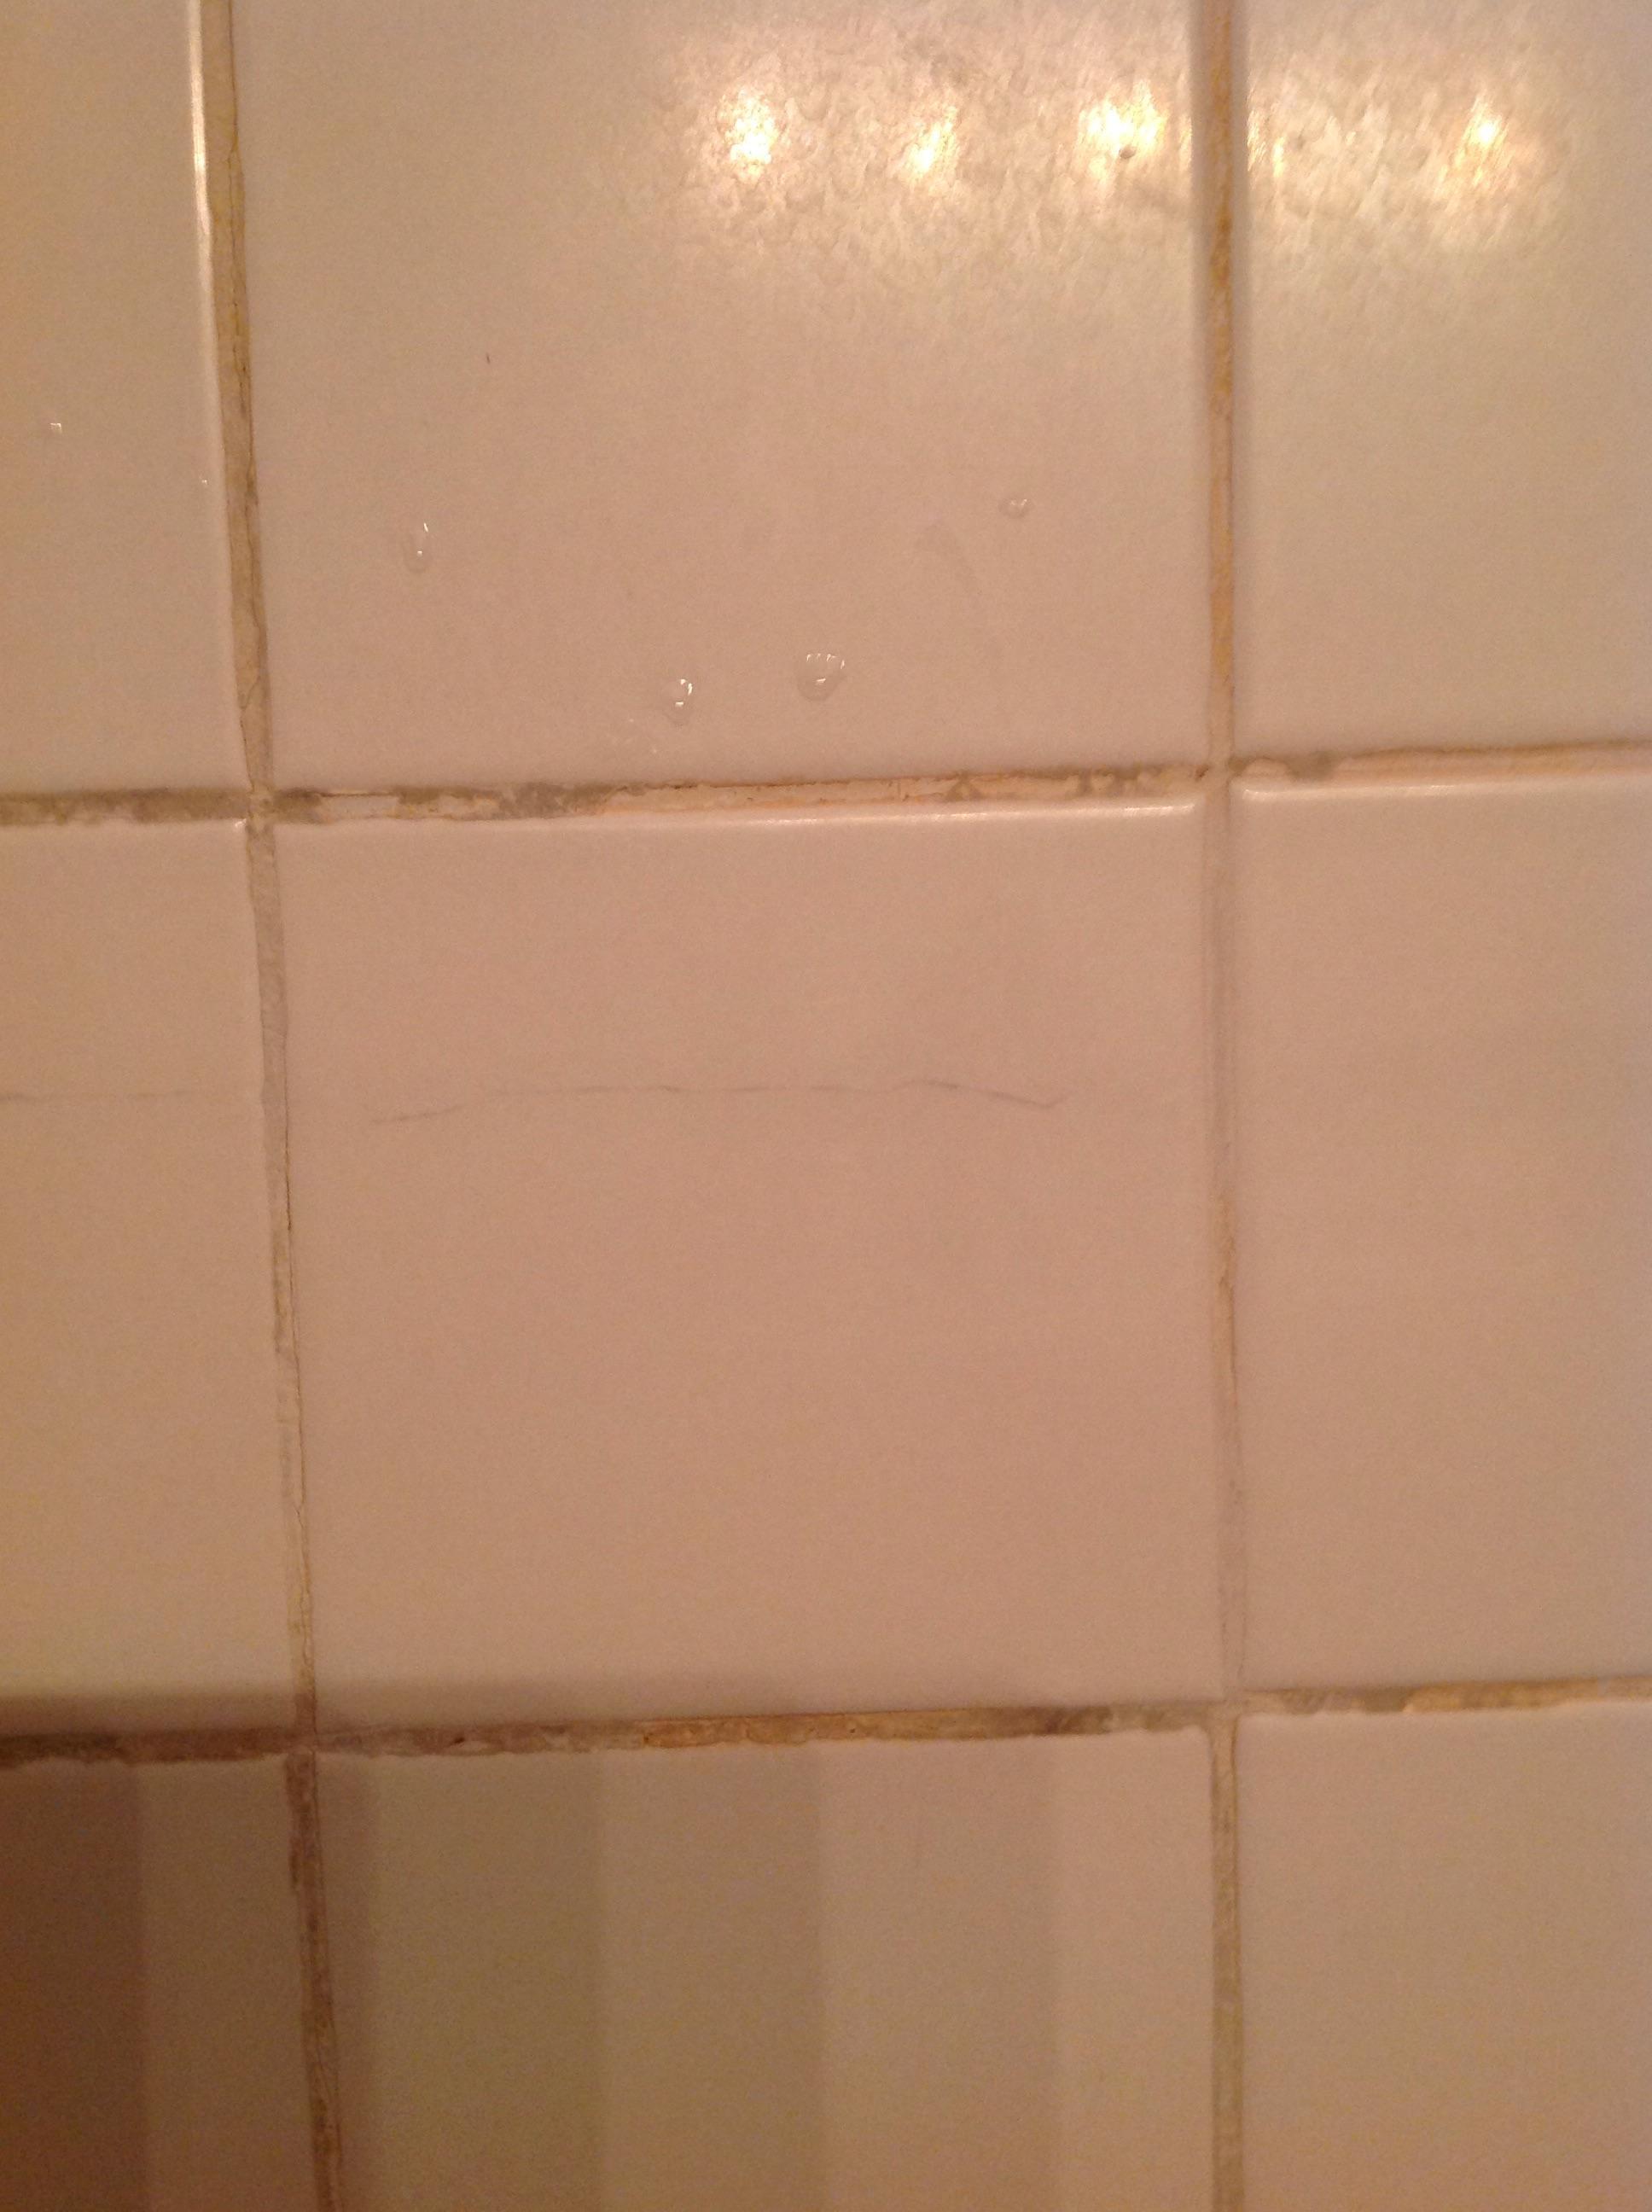 cracked bathroom tile runs almost